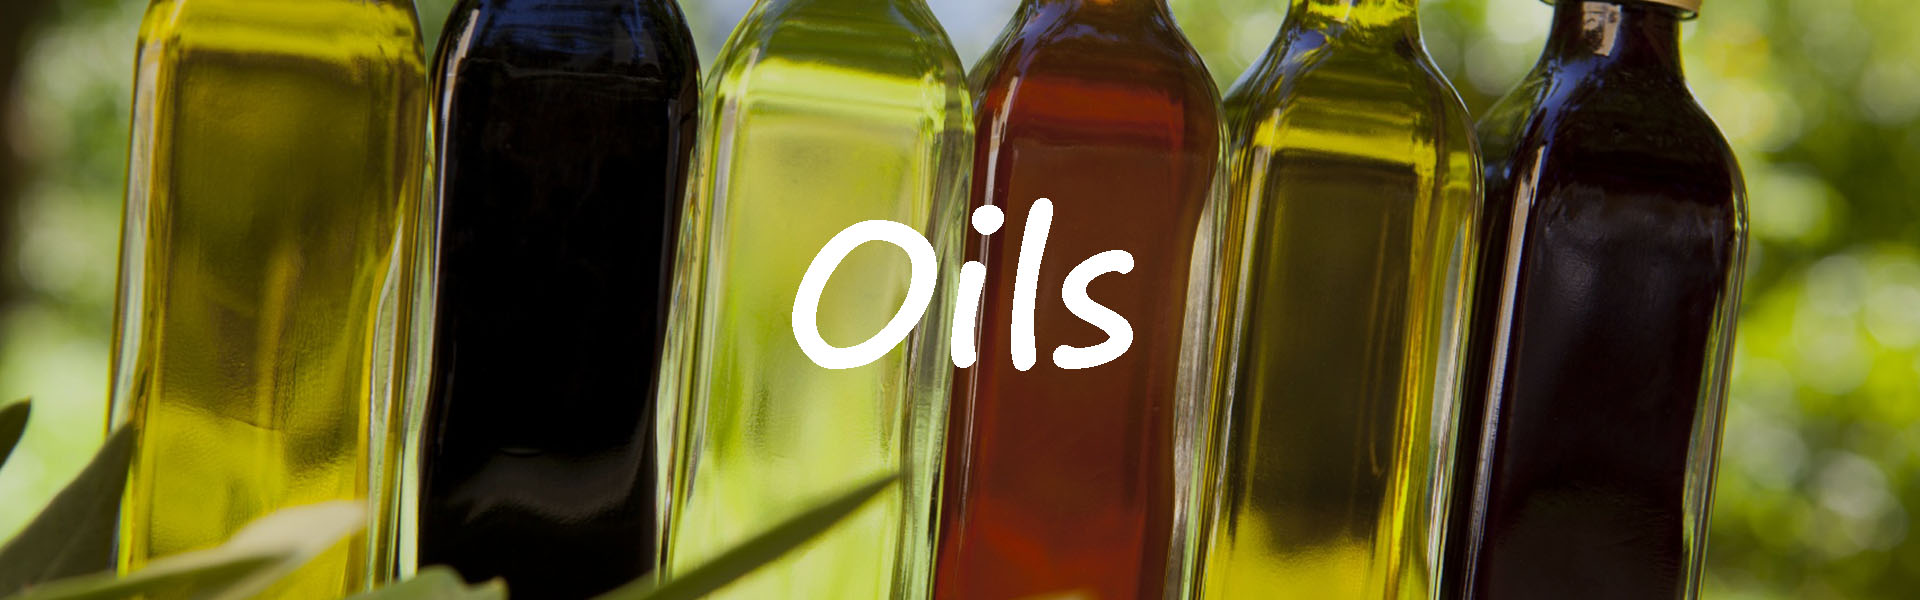 web-ready-oils-2